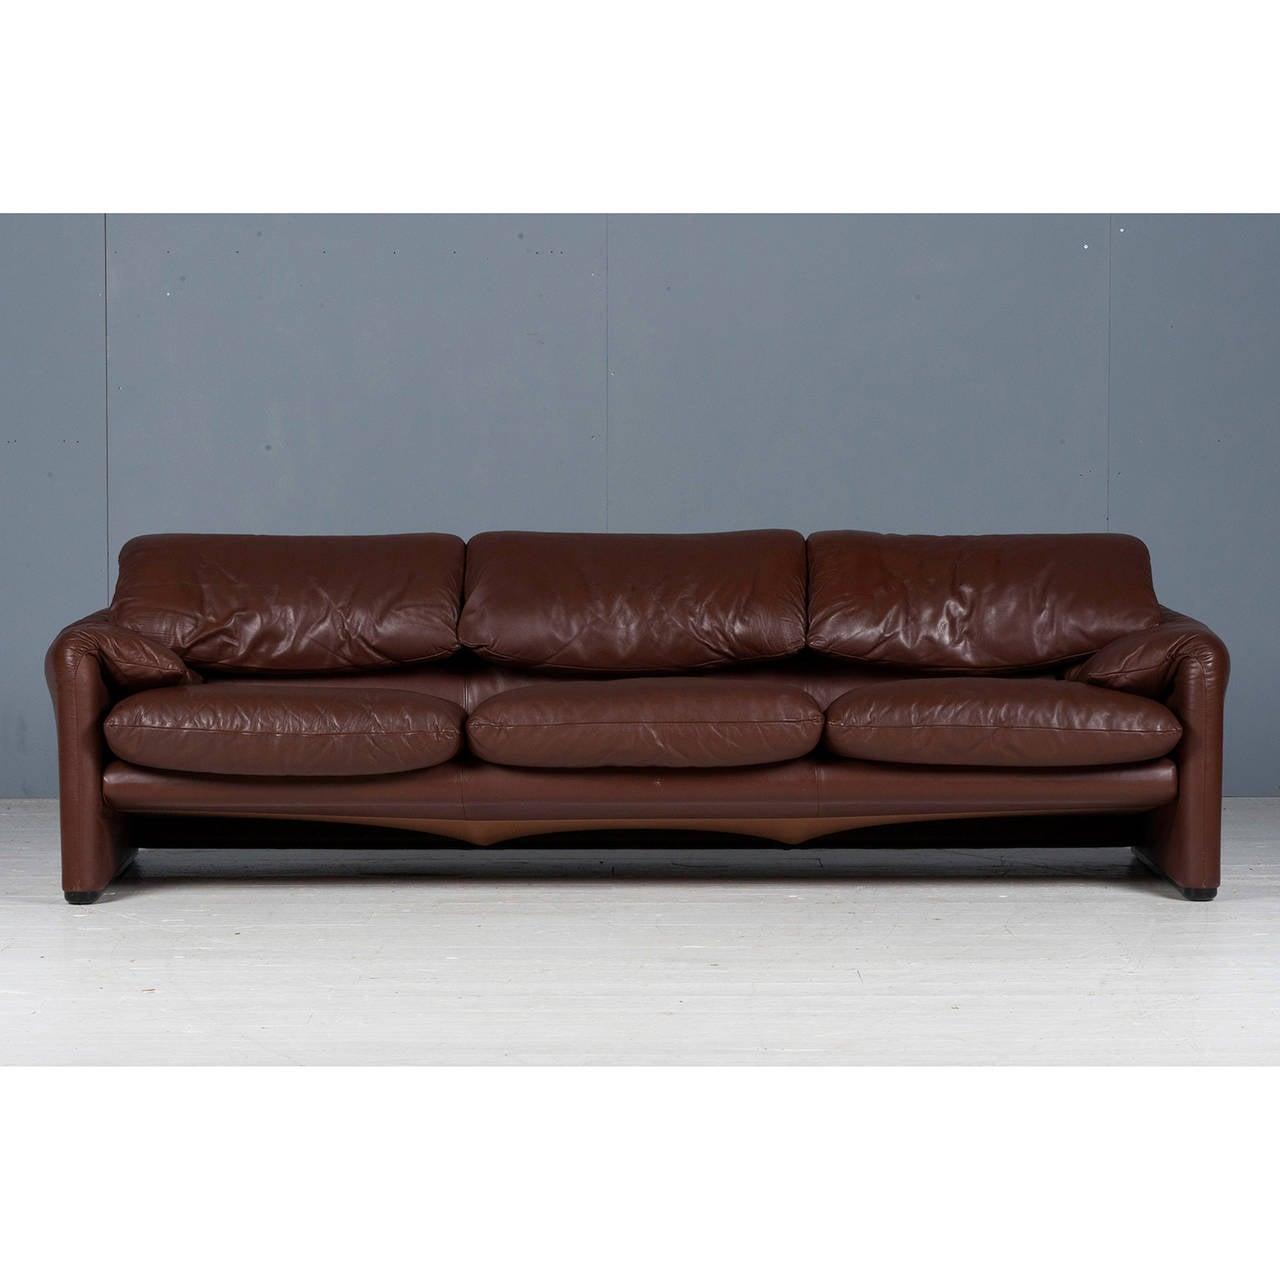 Maralunga Three Seat Sofa By Vico Magistretti For Cassina